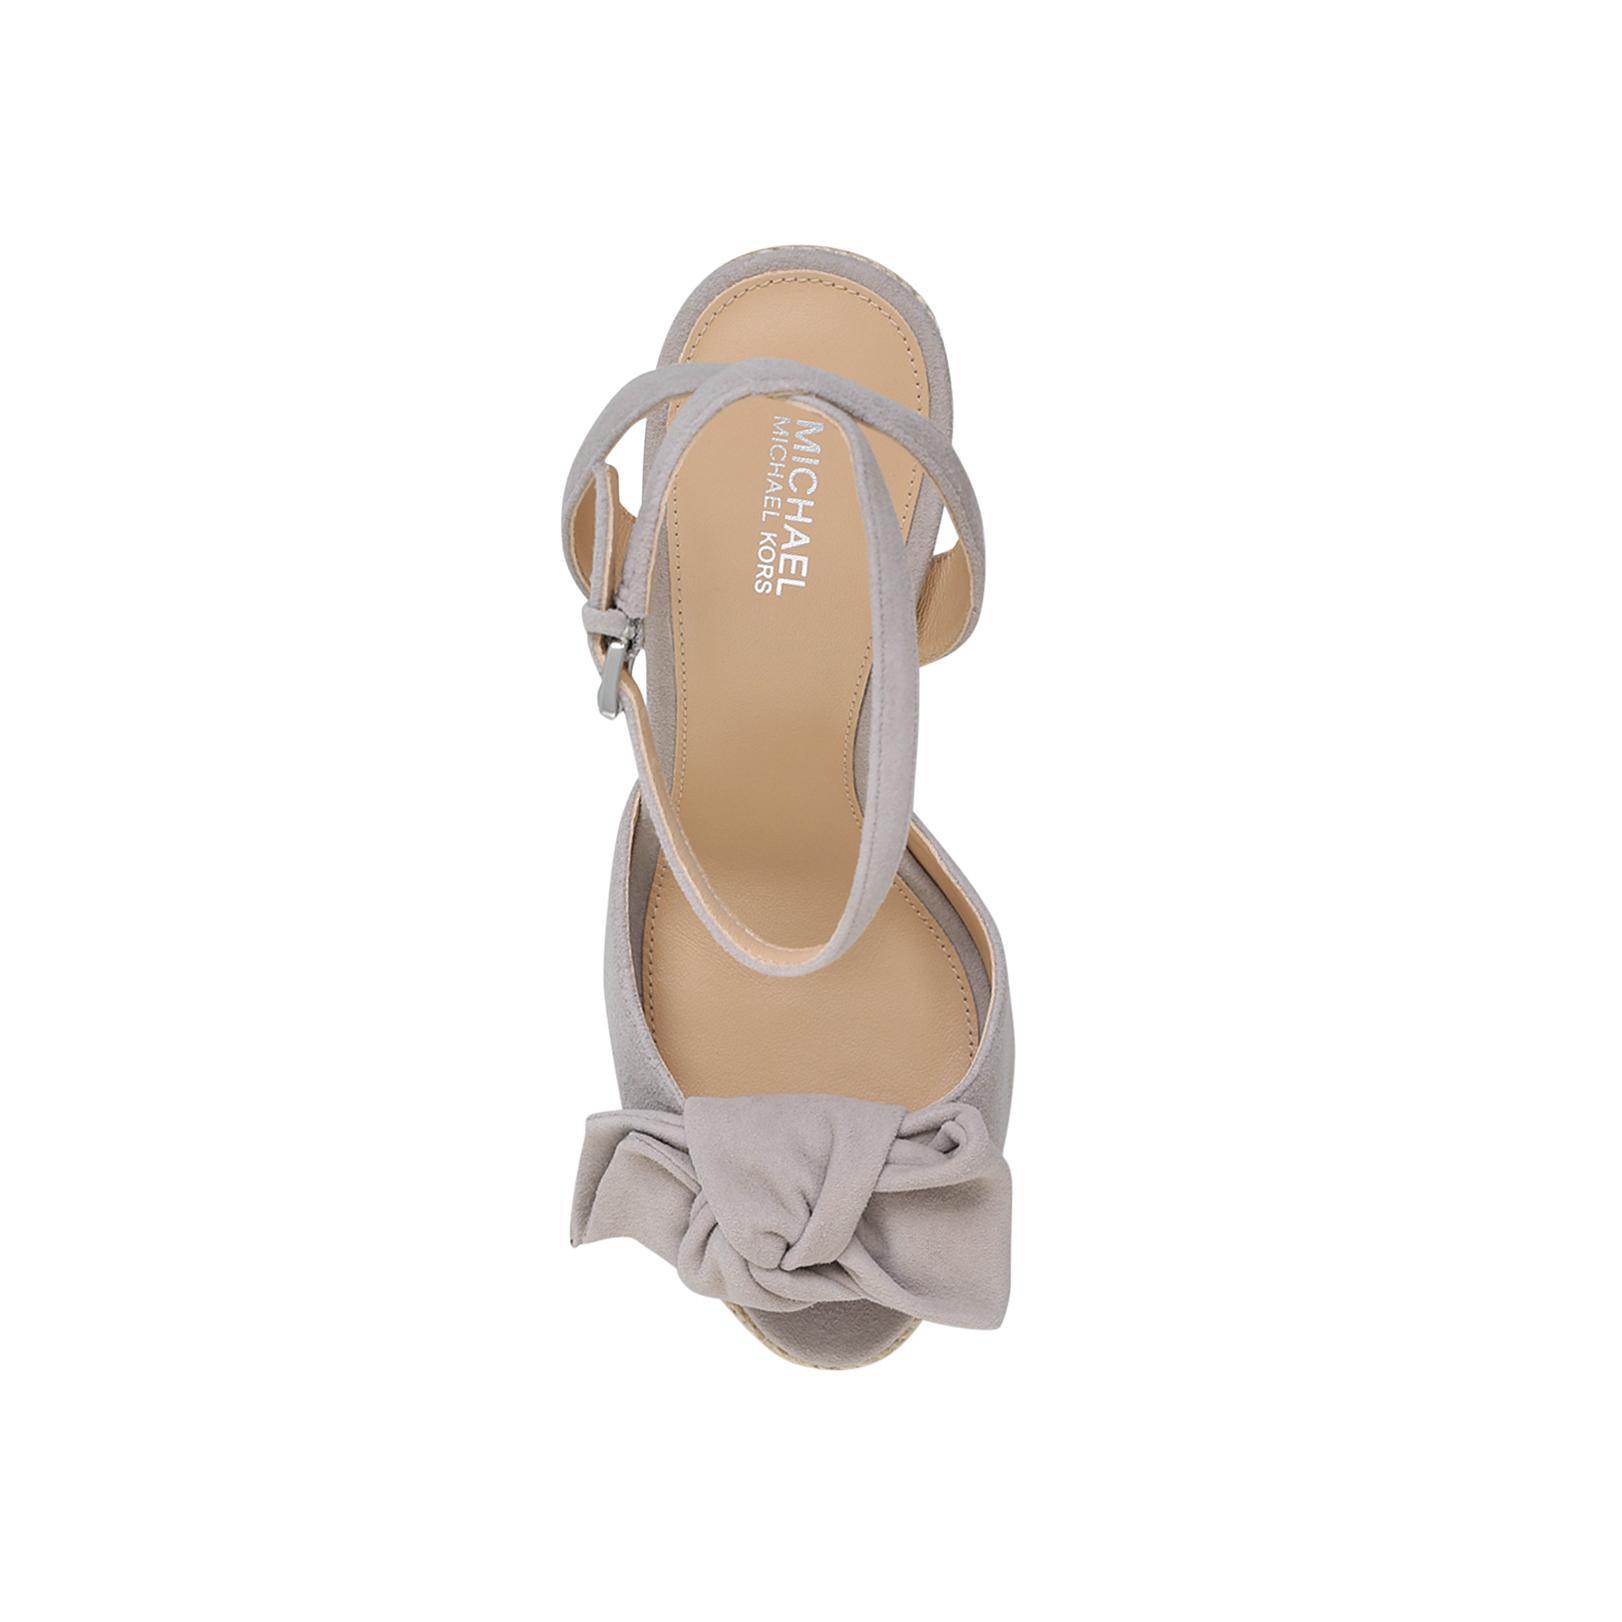 02564995686 WILLA WEDGE Michael Michael Kors Willa Mid Grey High Heel Sandals by ...